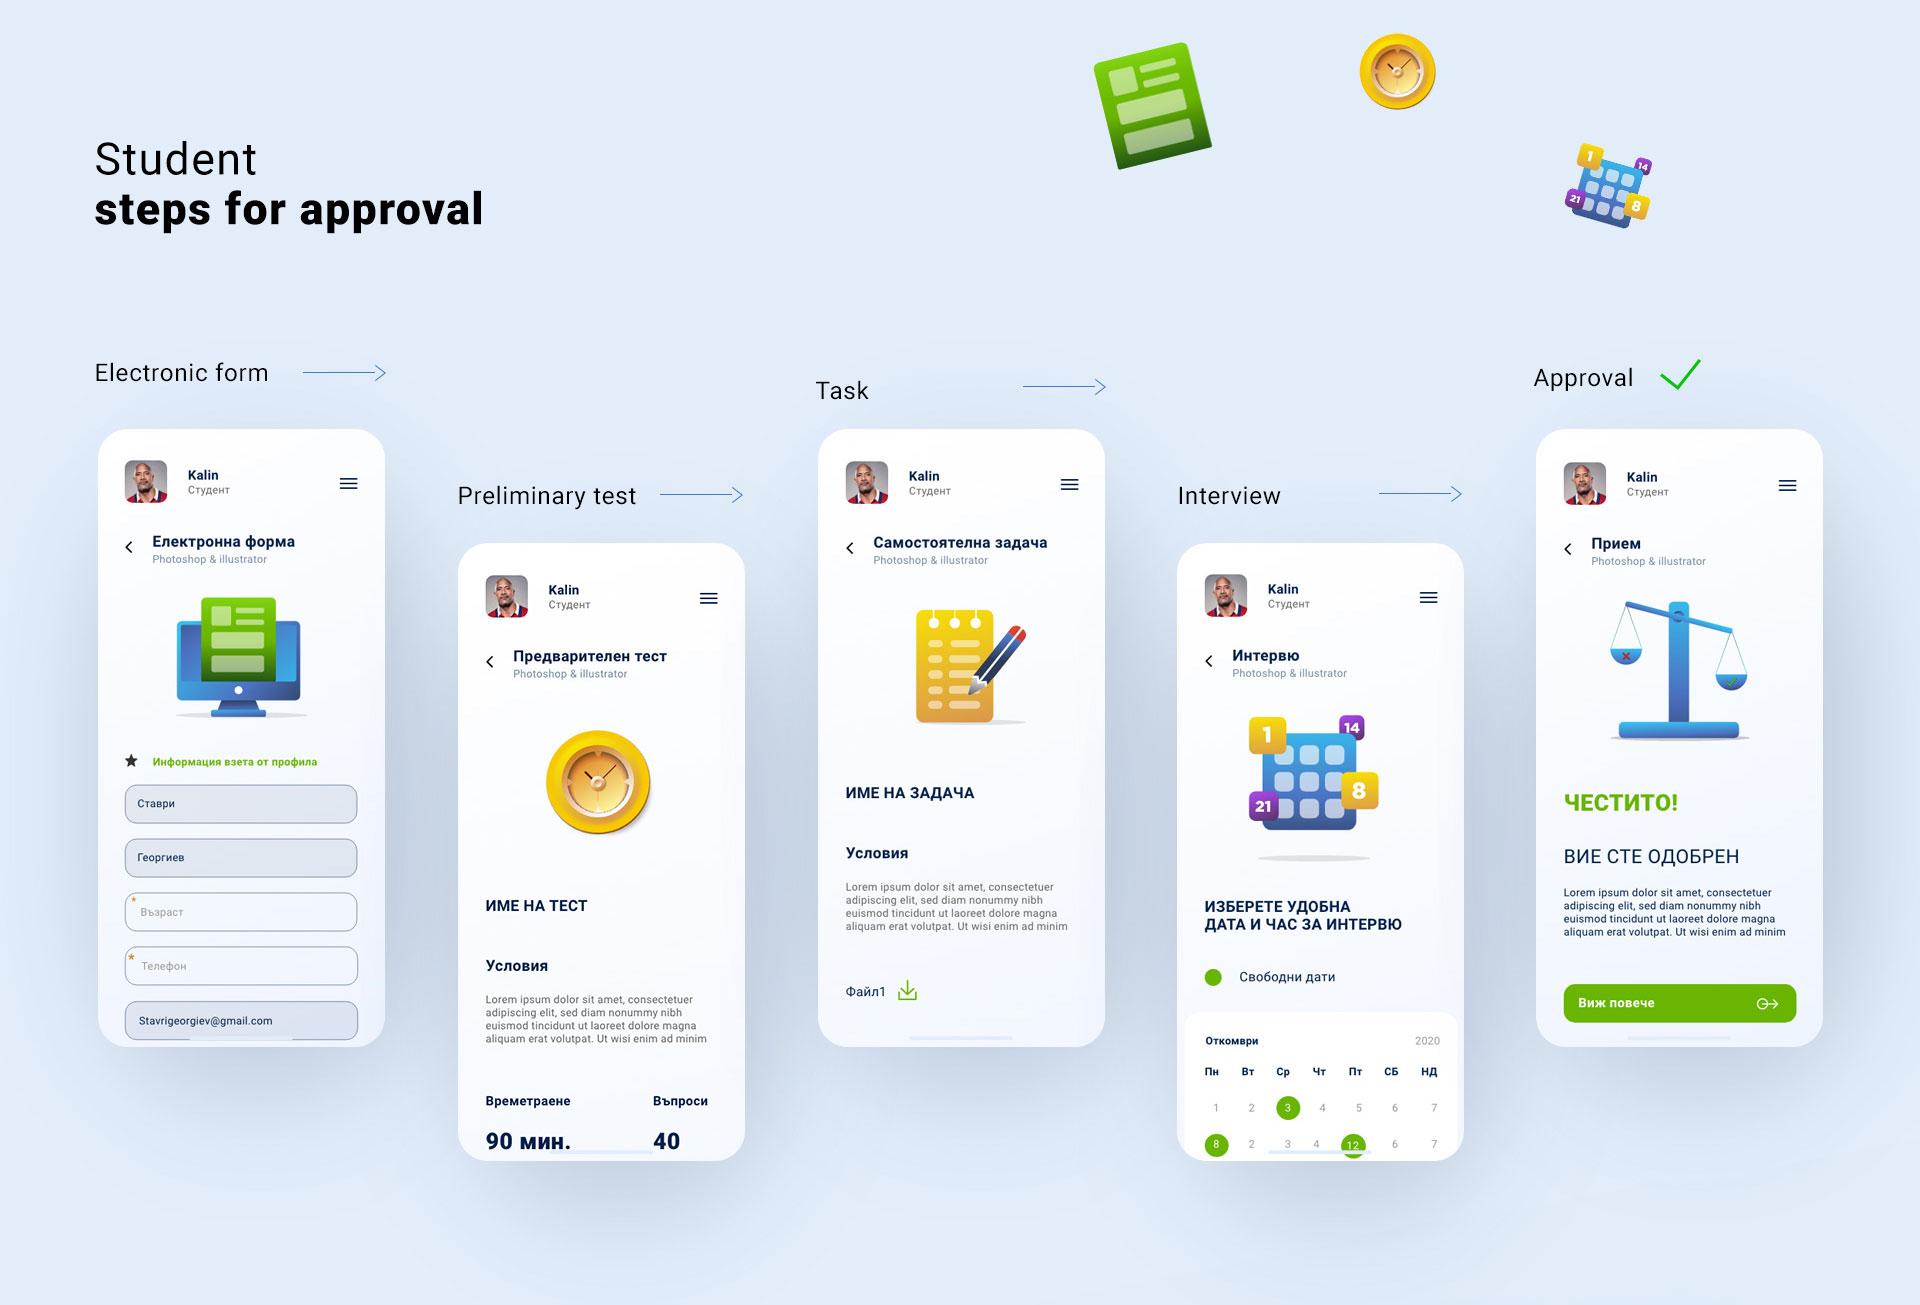 vratsa-software-eyas-presentation-2